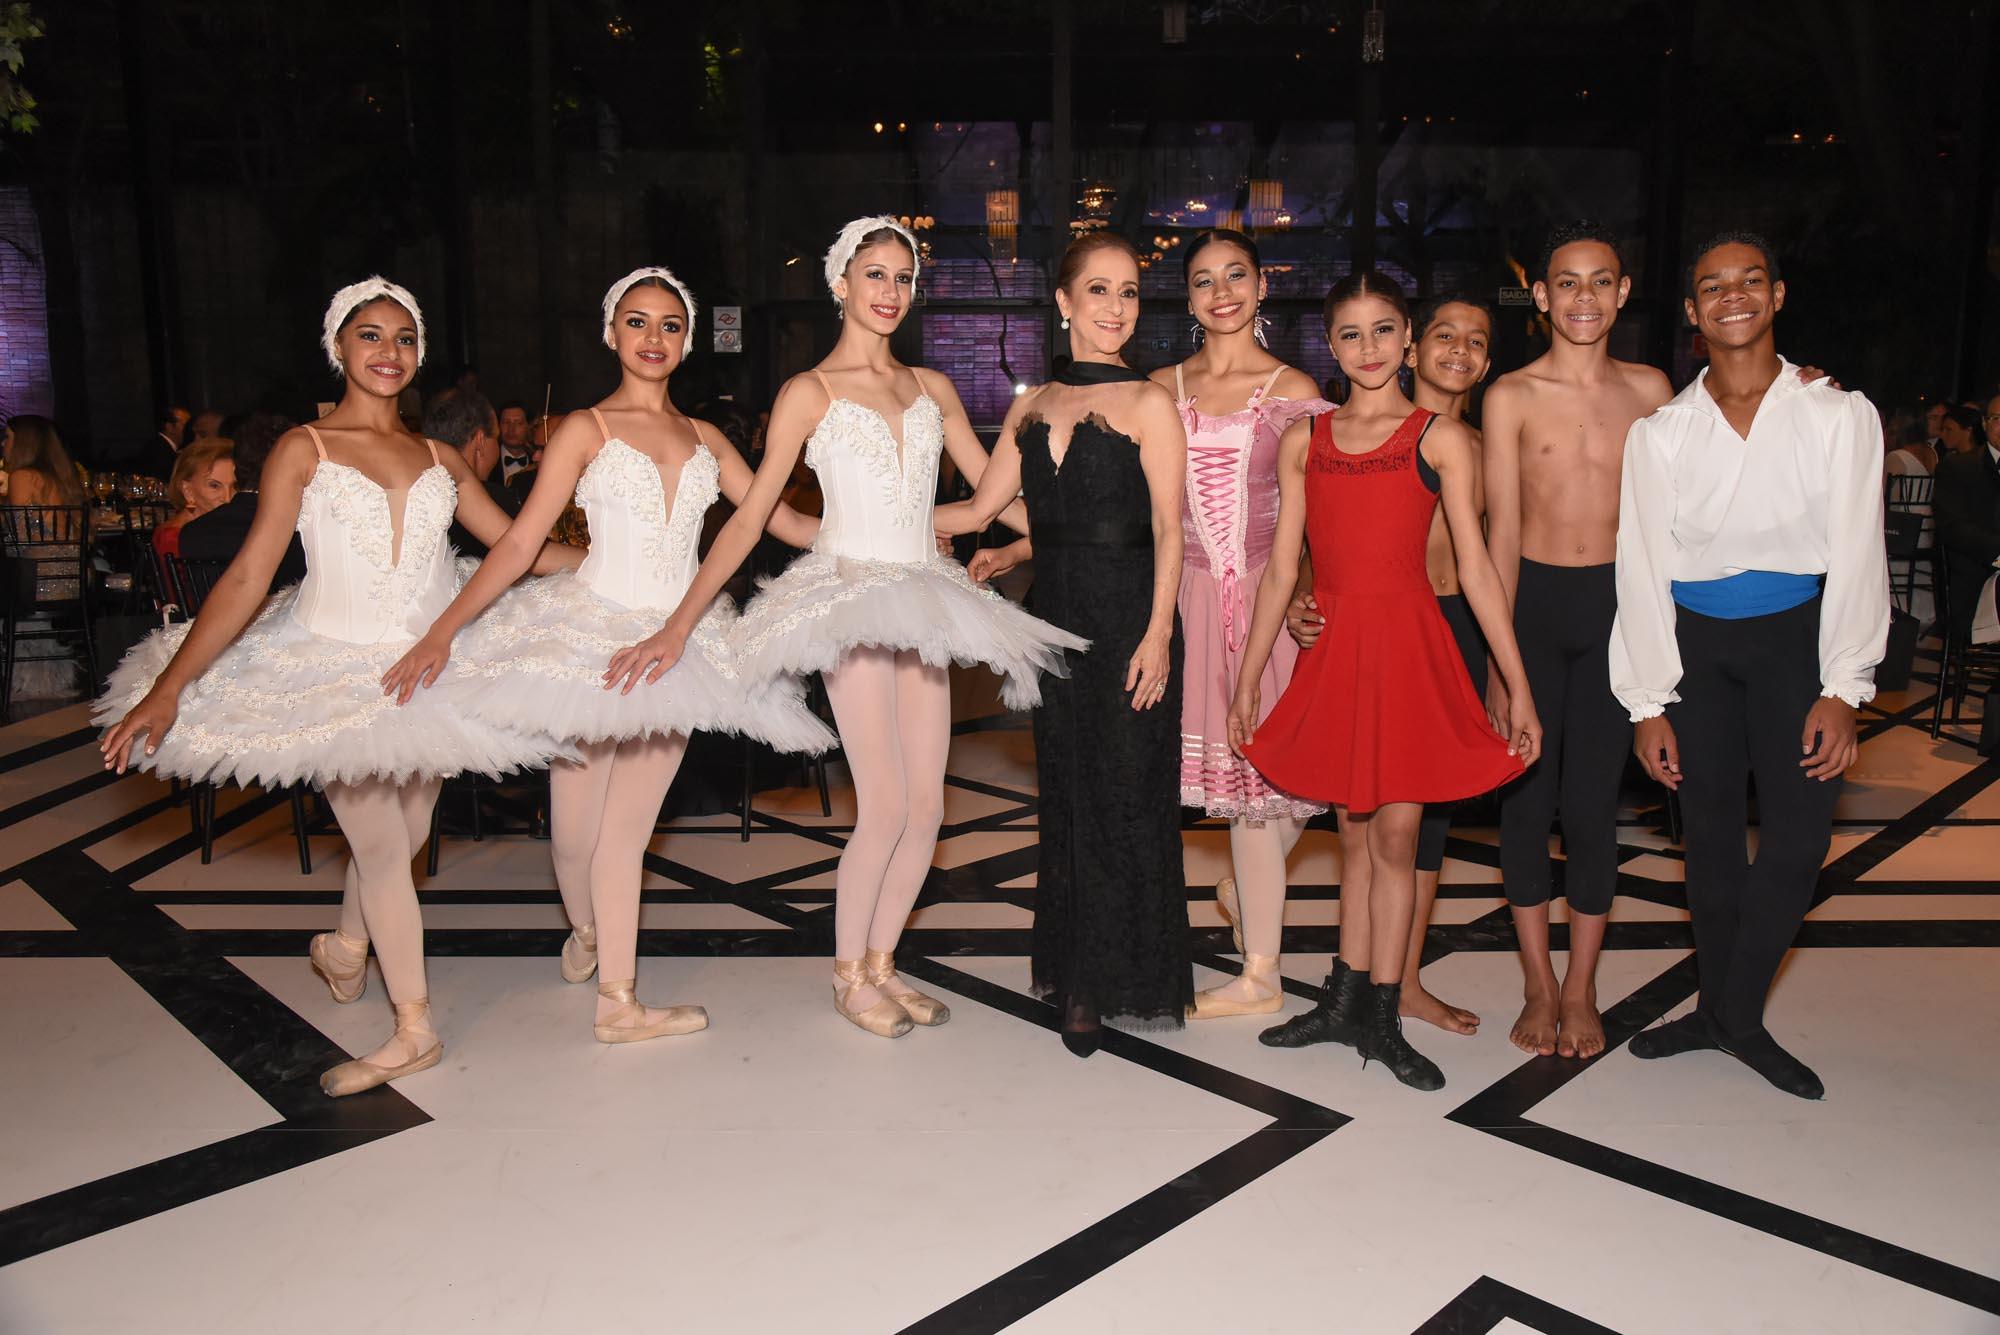 Ana Botafogo e Ballet Paraísopolis V BrazilFoundation Gala São Paulo Chanel 2018 Filantropia Brasil Philanthropy Brazil